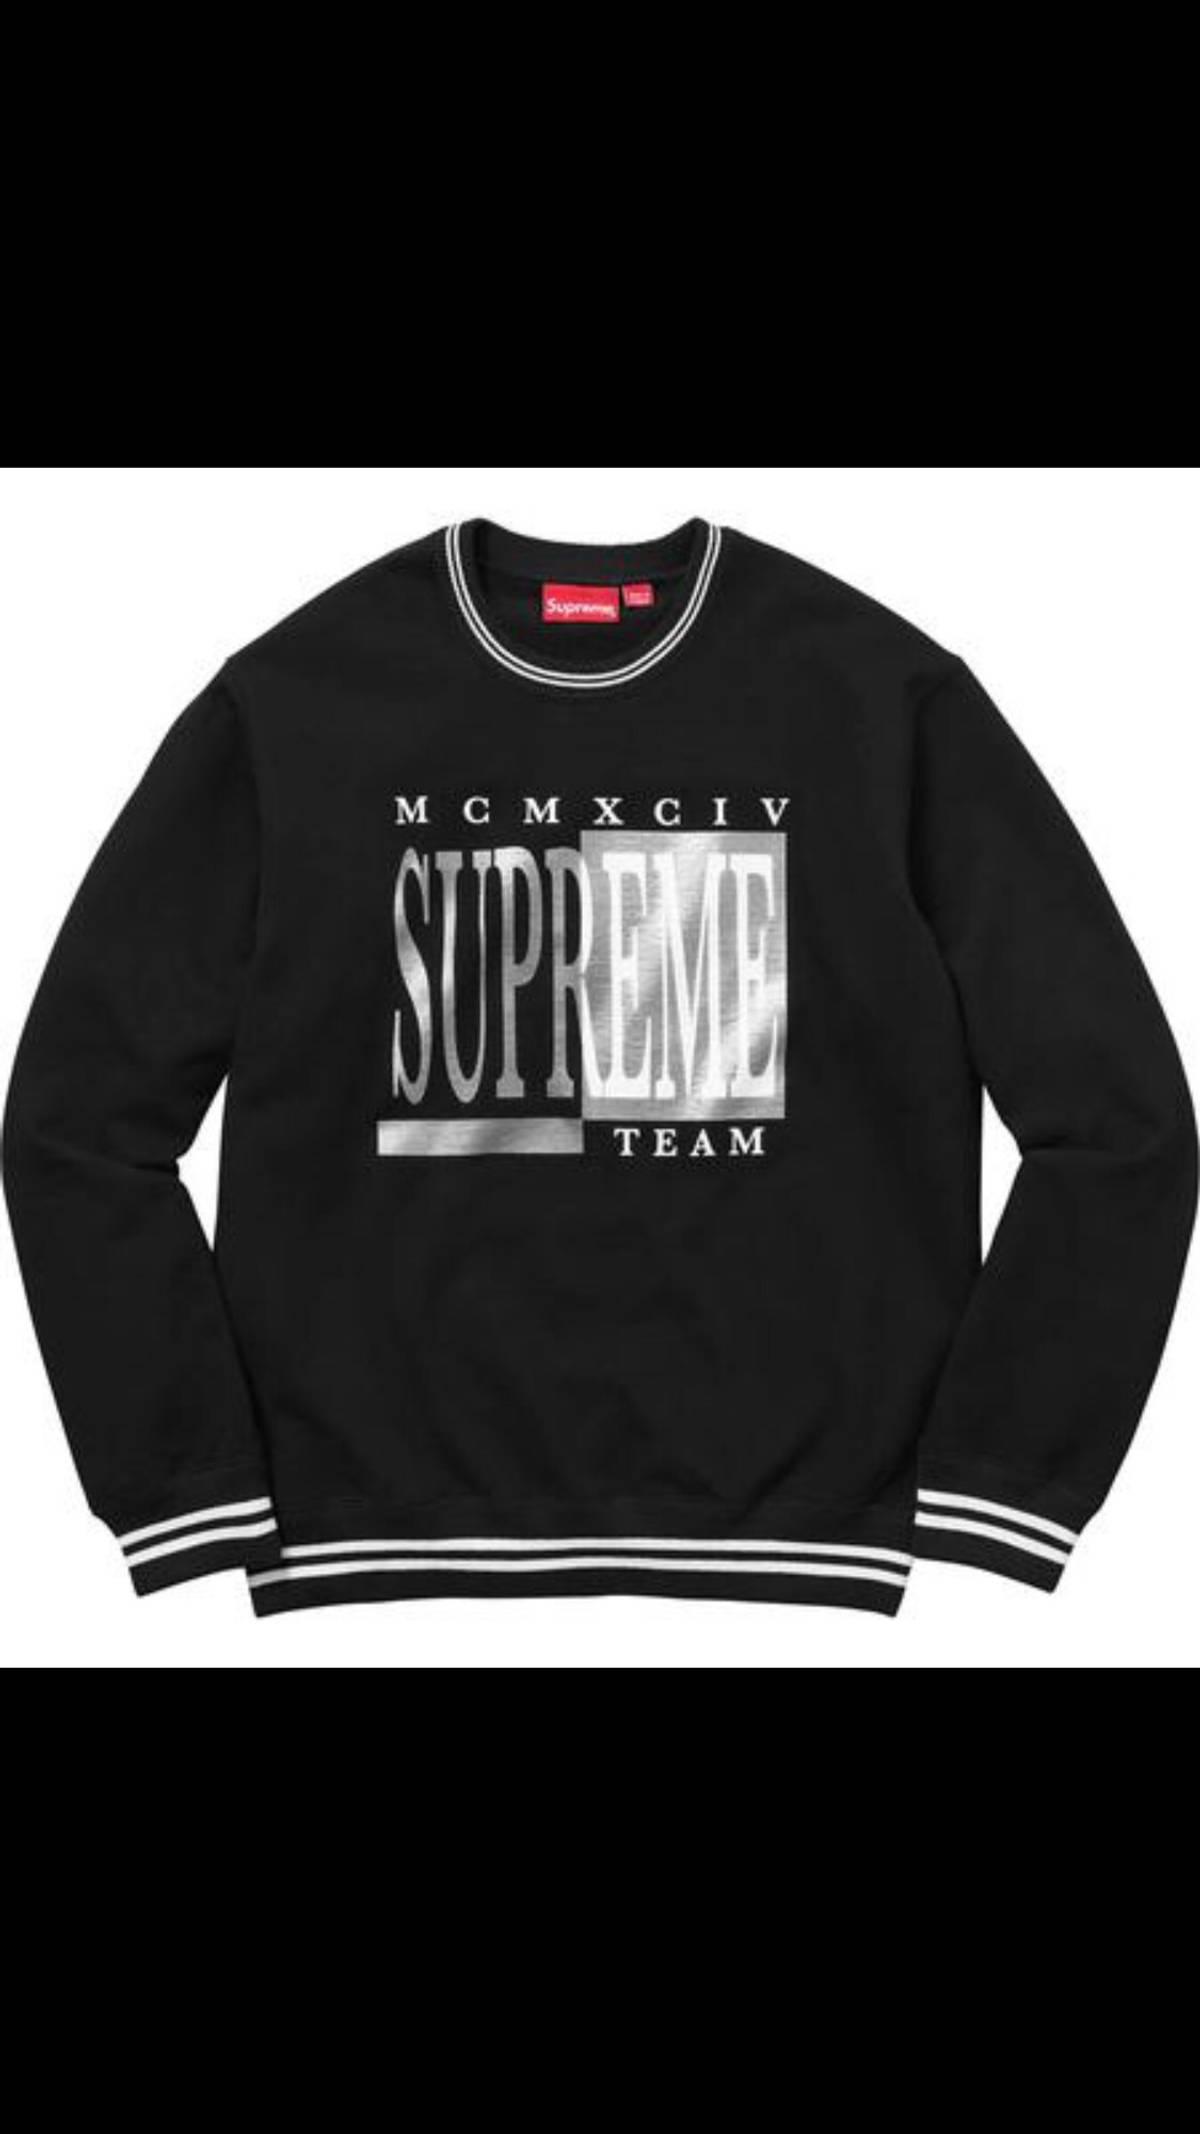 faf1ff14c01b Supreme Supreme Team Crewneck Large Black Sweater Size l - Sweaters ...